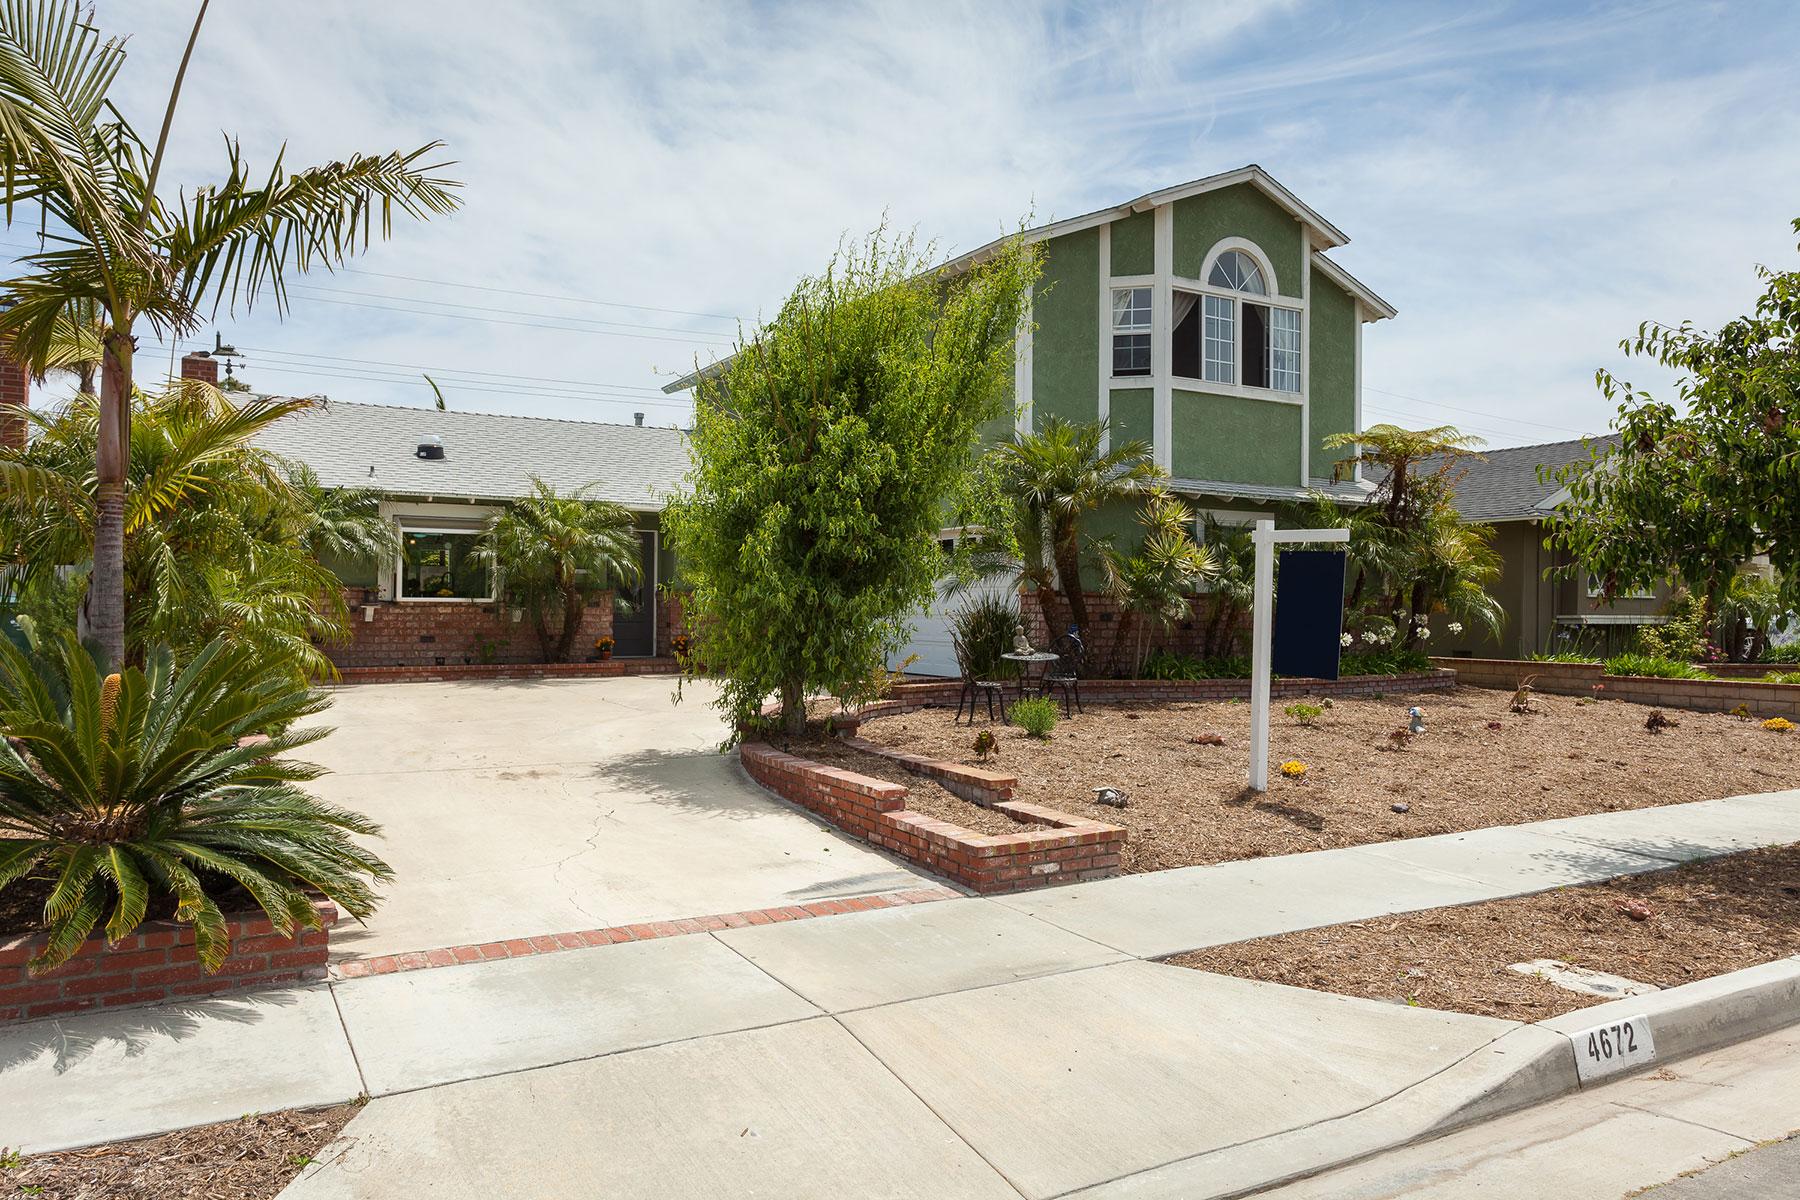 Single Family Home for Sale at 4672 Rhapsody 4672 Rhapsody Dr. Huntington Beach, California, 92649 United States